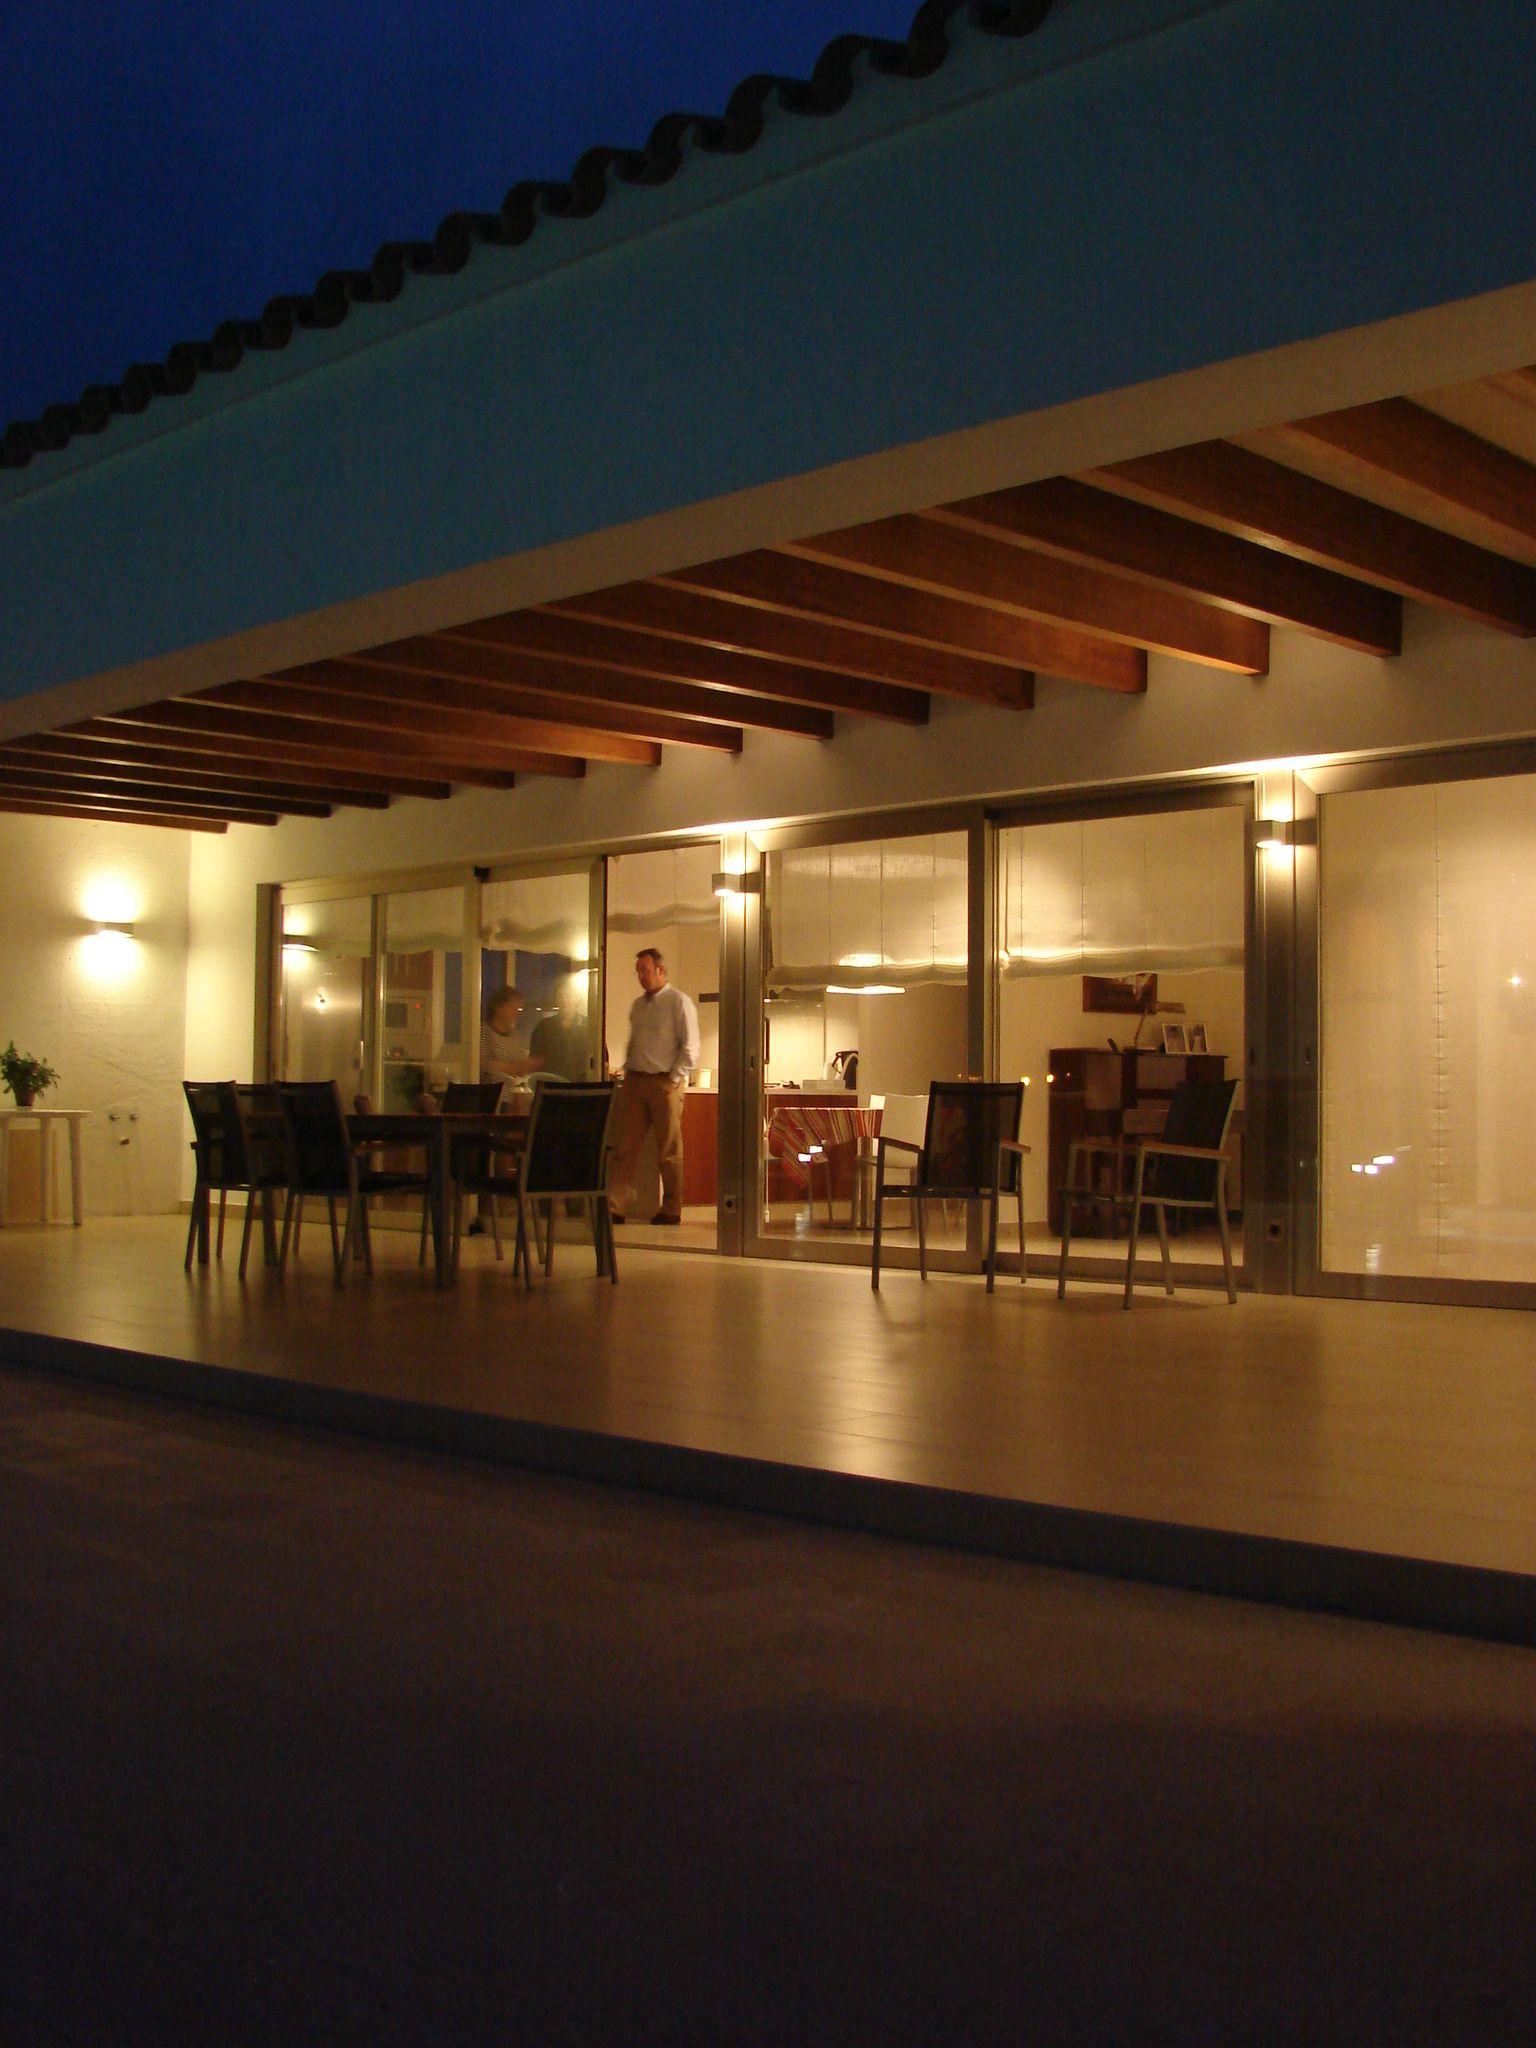 Exterior porche terraza contemporaneo decoracion via for Cobertizo de madera de jardin contemporaneo